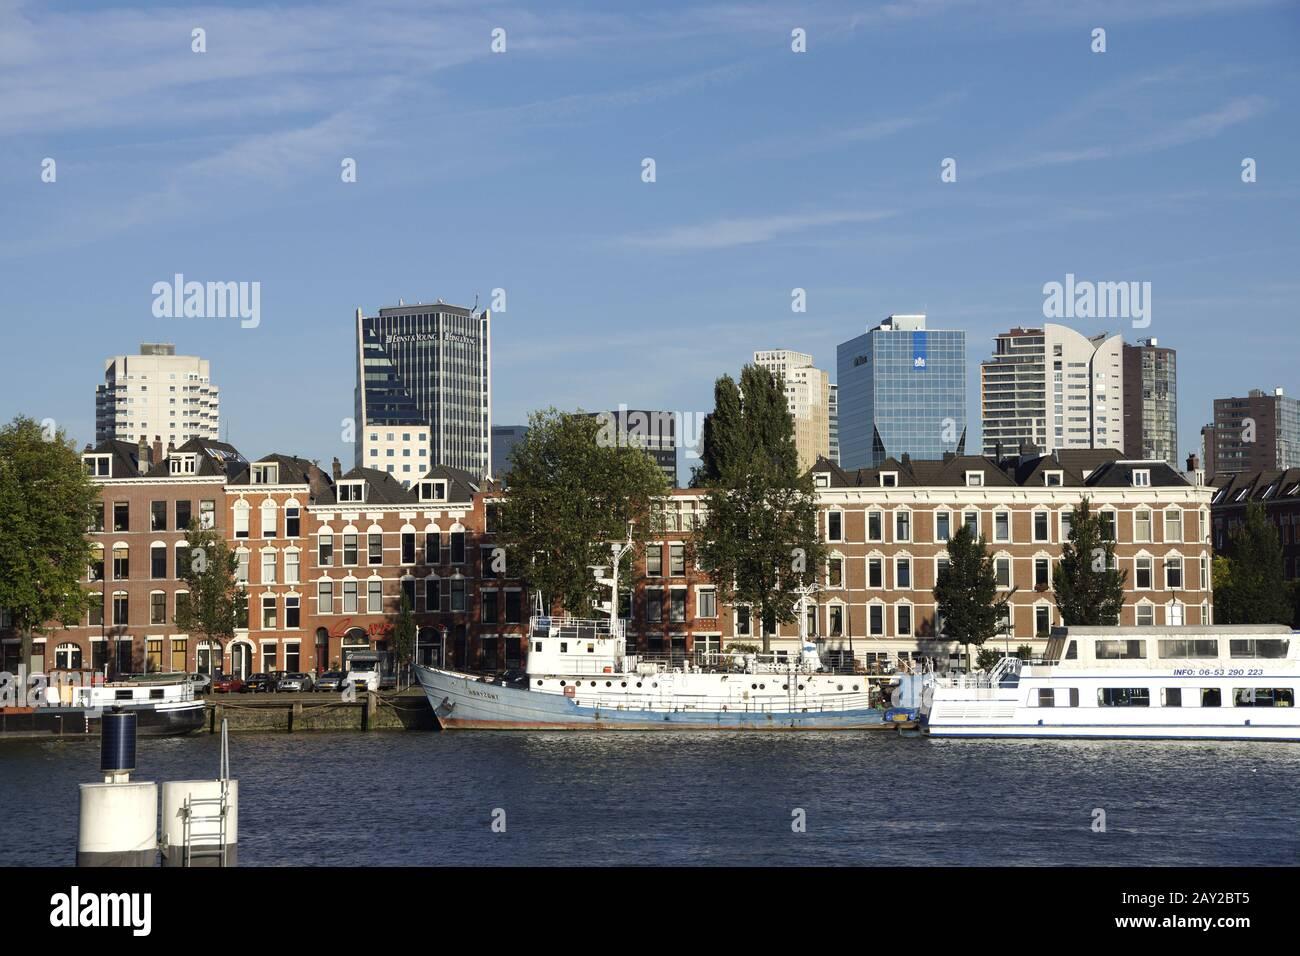 Skyline in Rotterdam, Stadsdriehoek and Noordereil Stock Photo